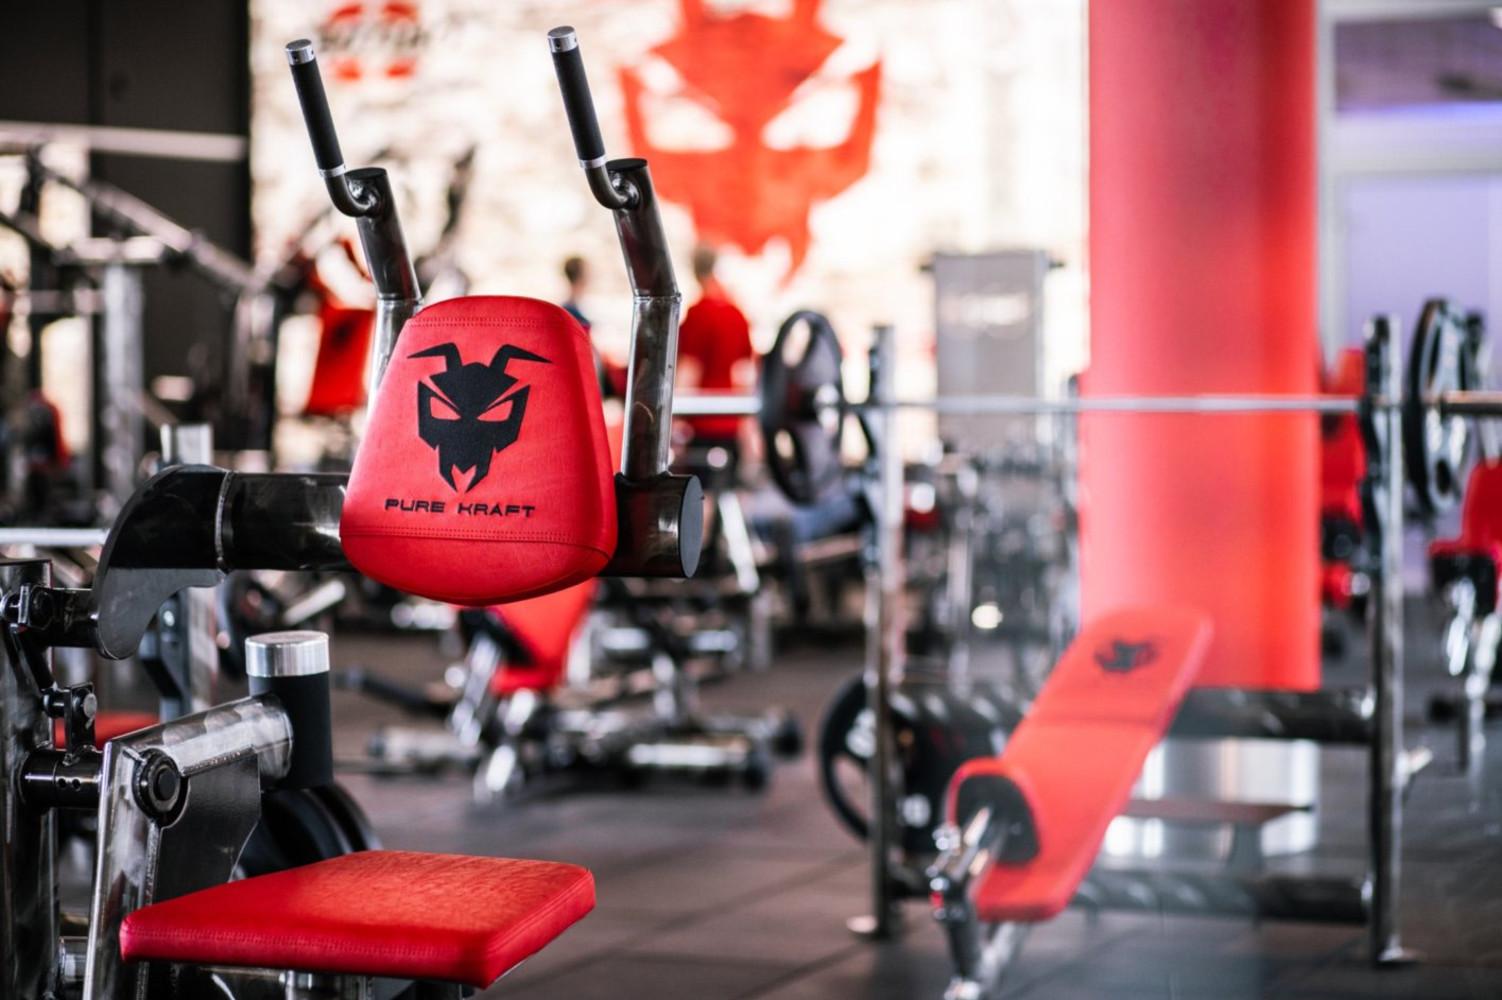 Ai Fitness Dortmund City Ziva Nation Jetz Iron Gym Course Schedule